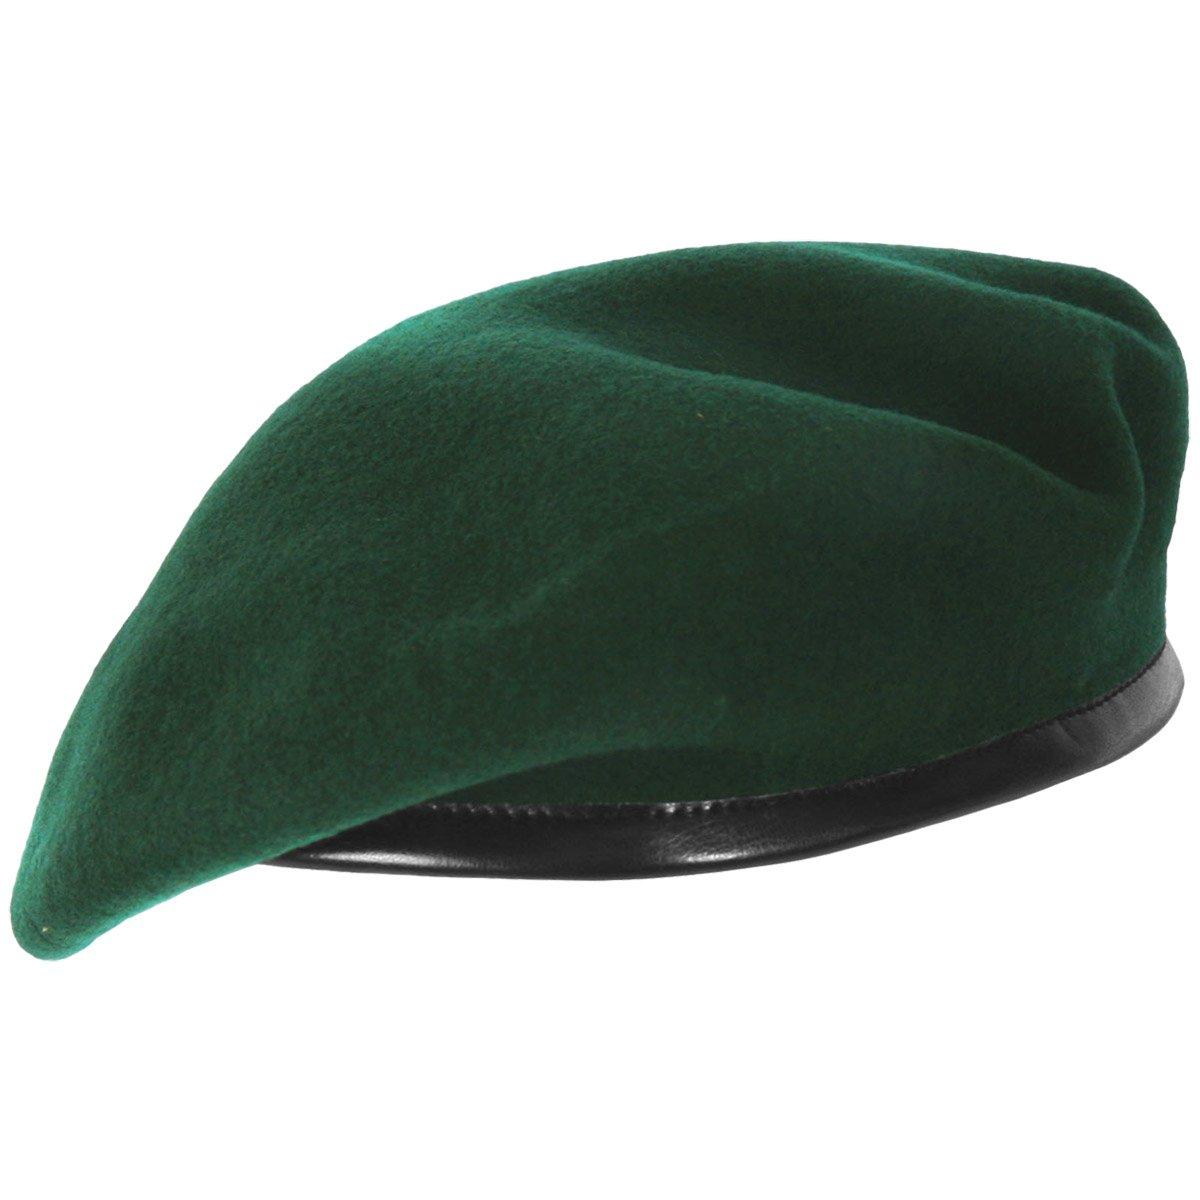 692d9dc5 Pentagon Beret Olive at Amazon Men's Clothing store: